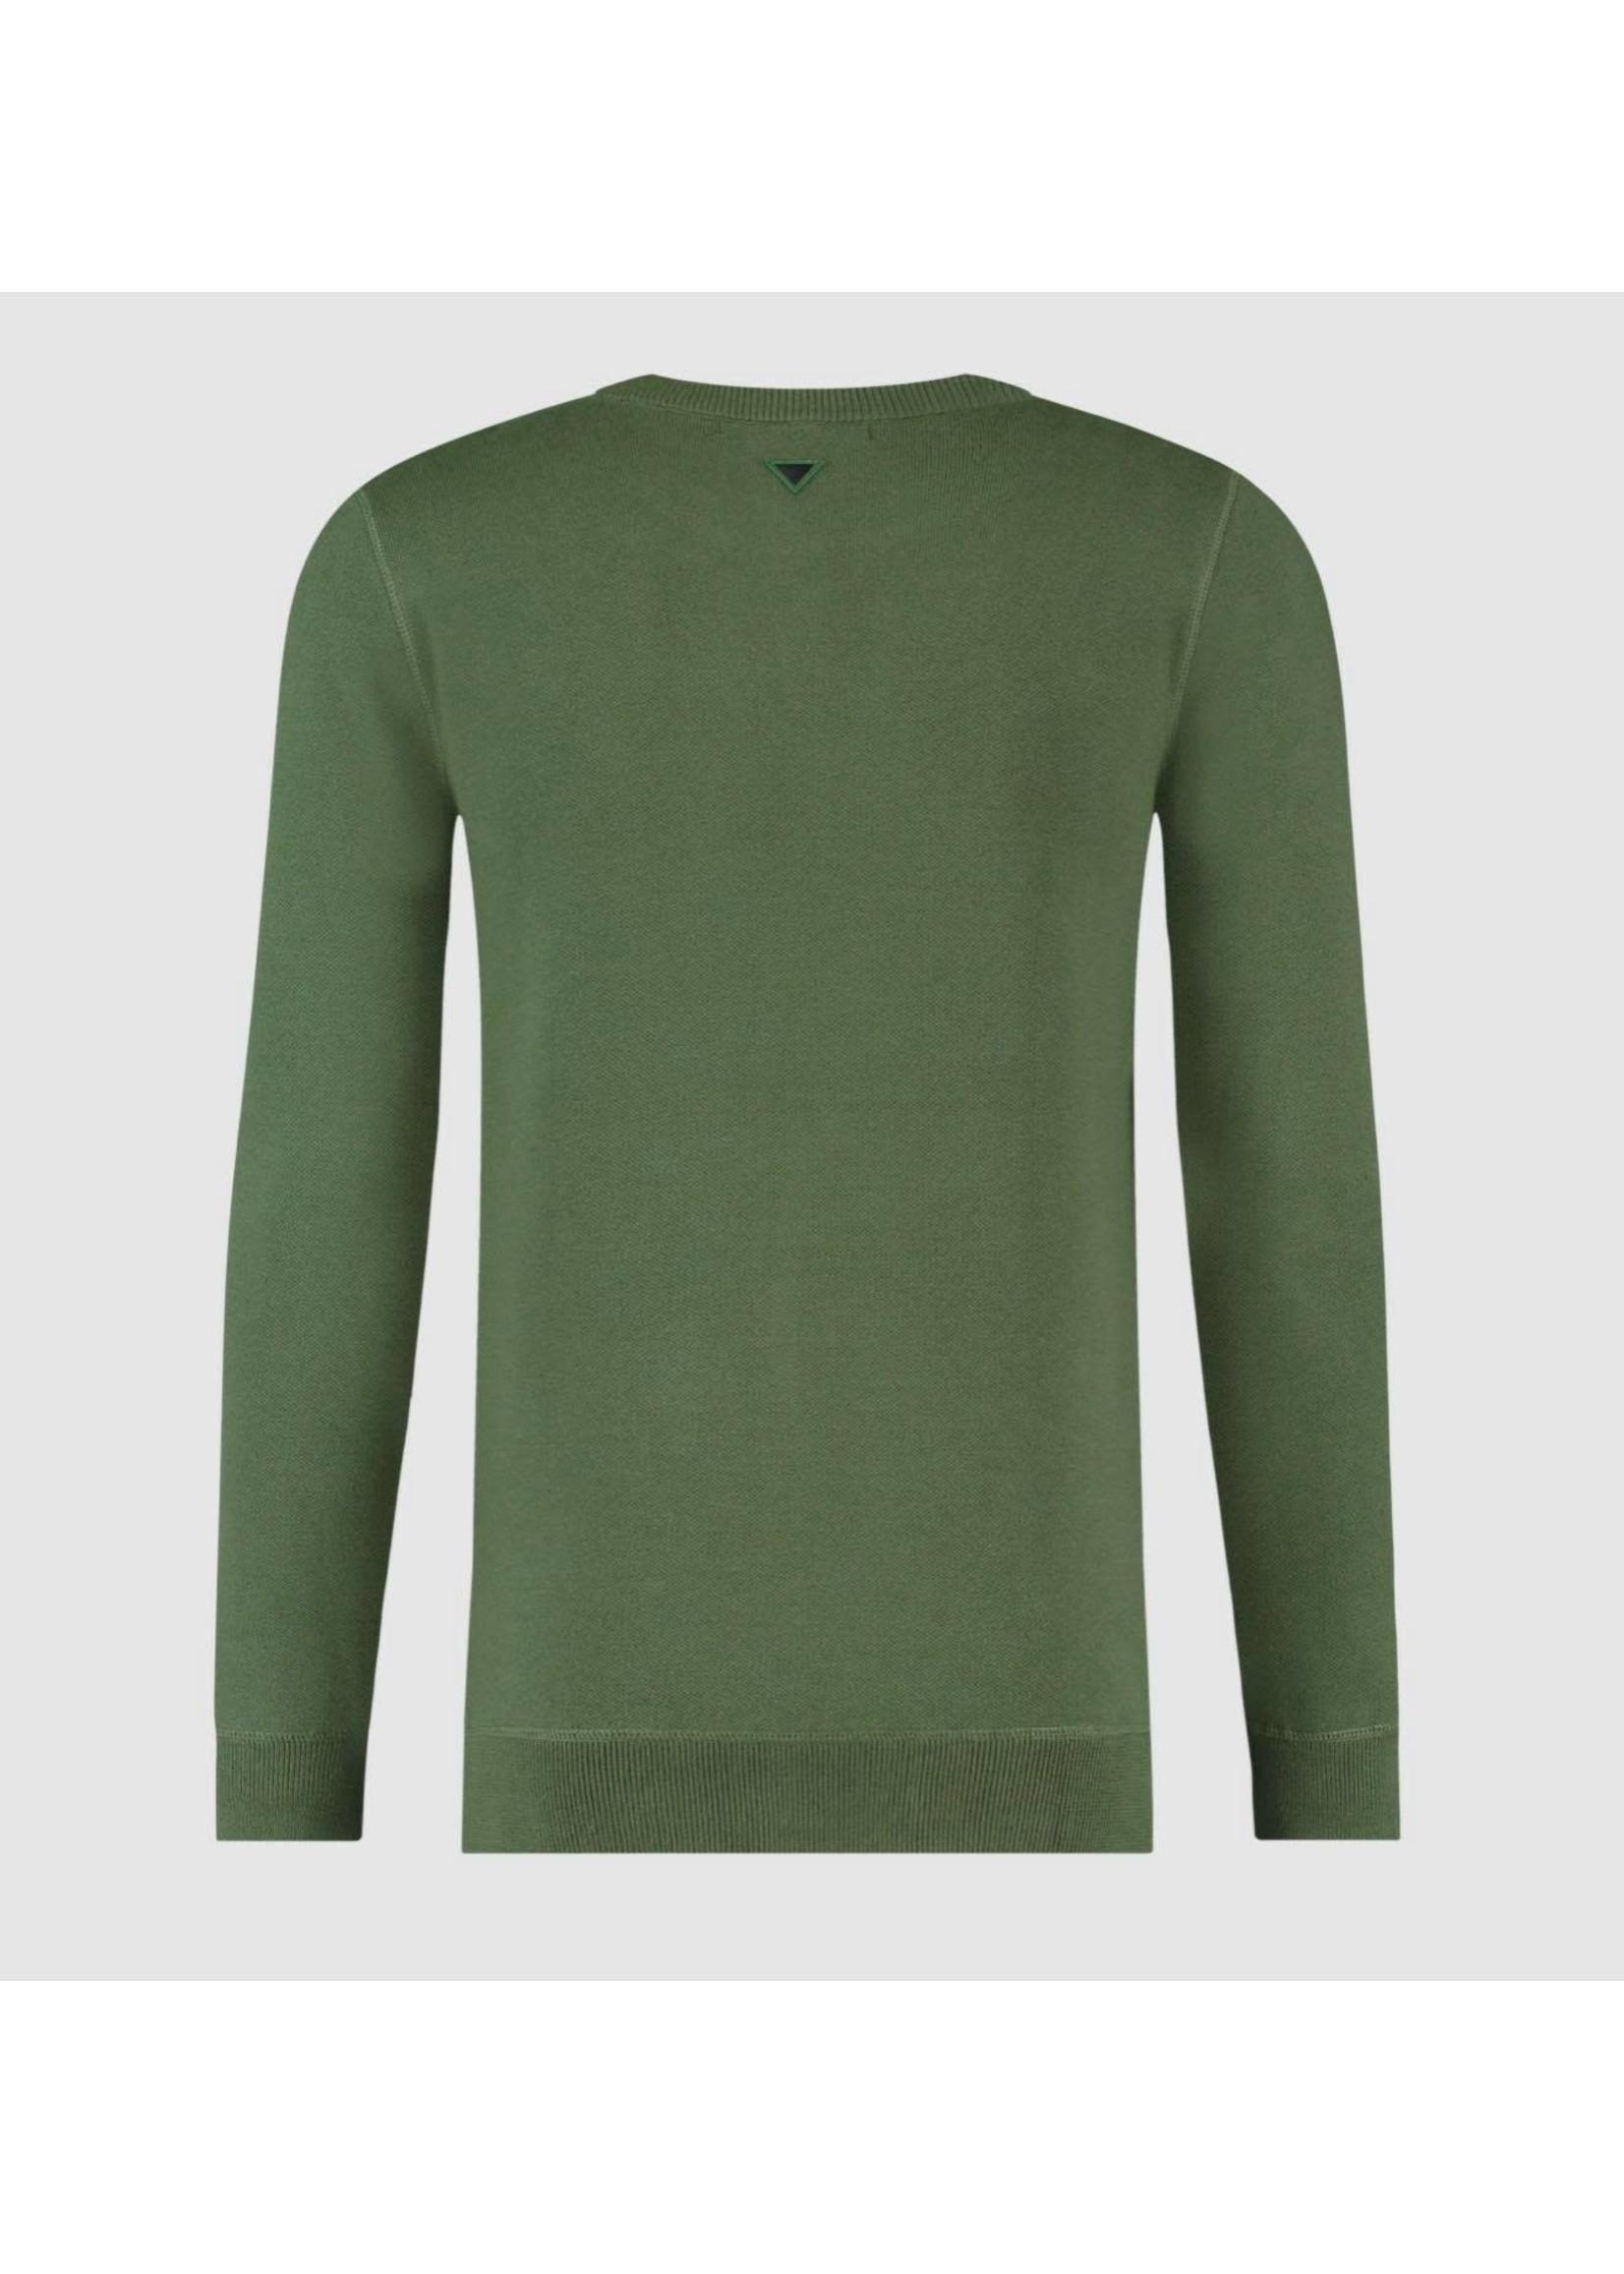 Purewhite Purewhite Knitted Crewneck - Army Green